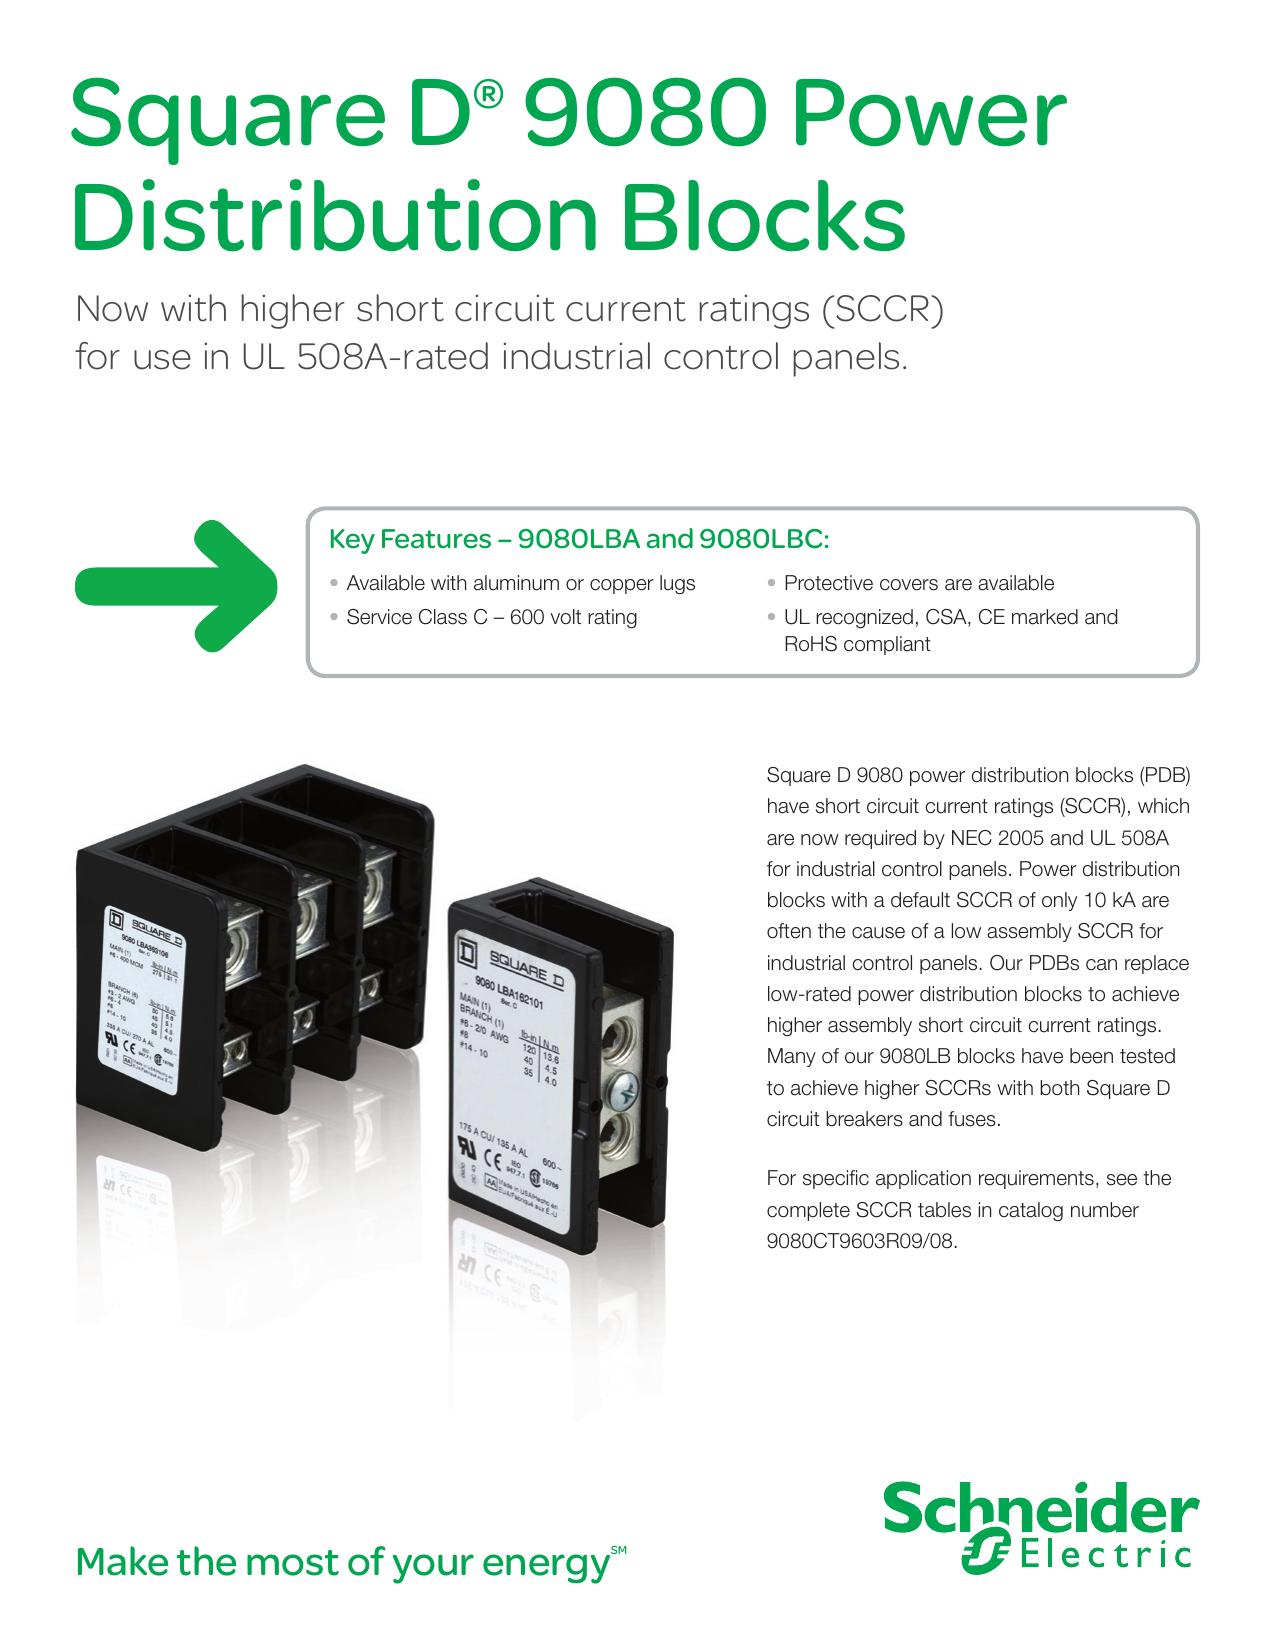 Square D® 9080 Power Distribution Blocks